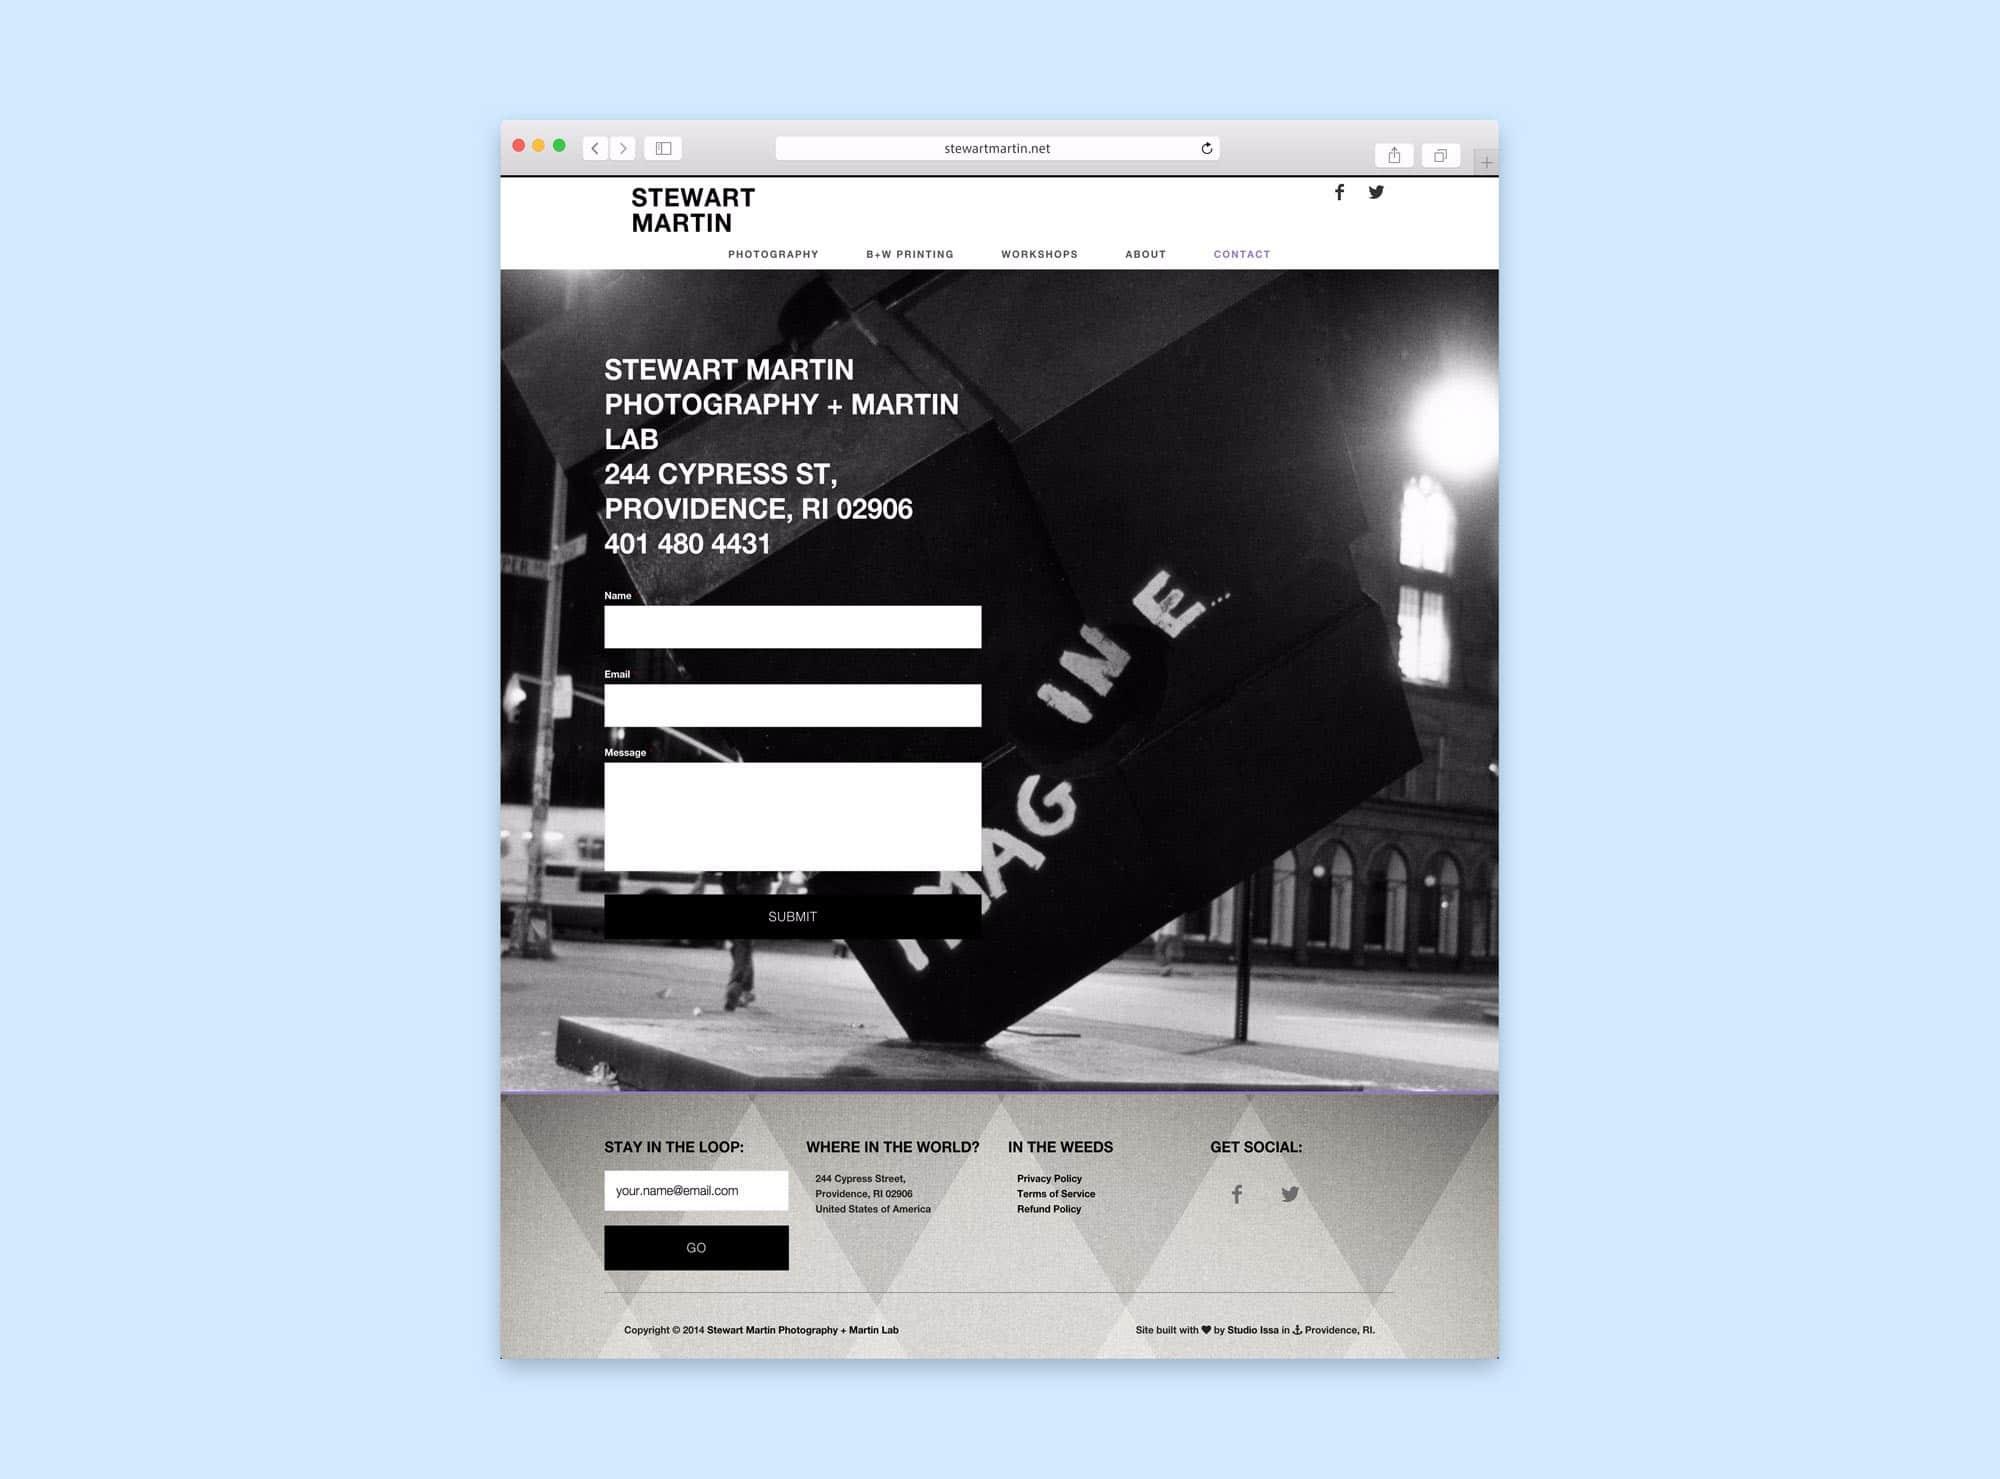 stewart-martin-contact-page-windows